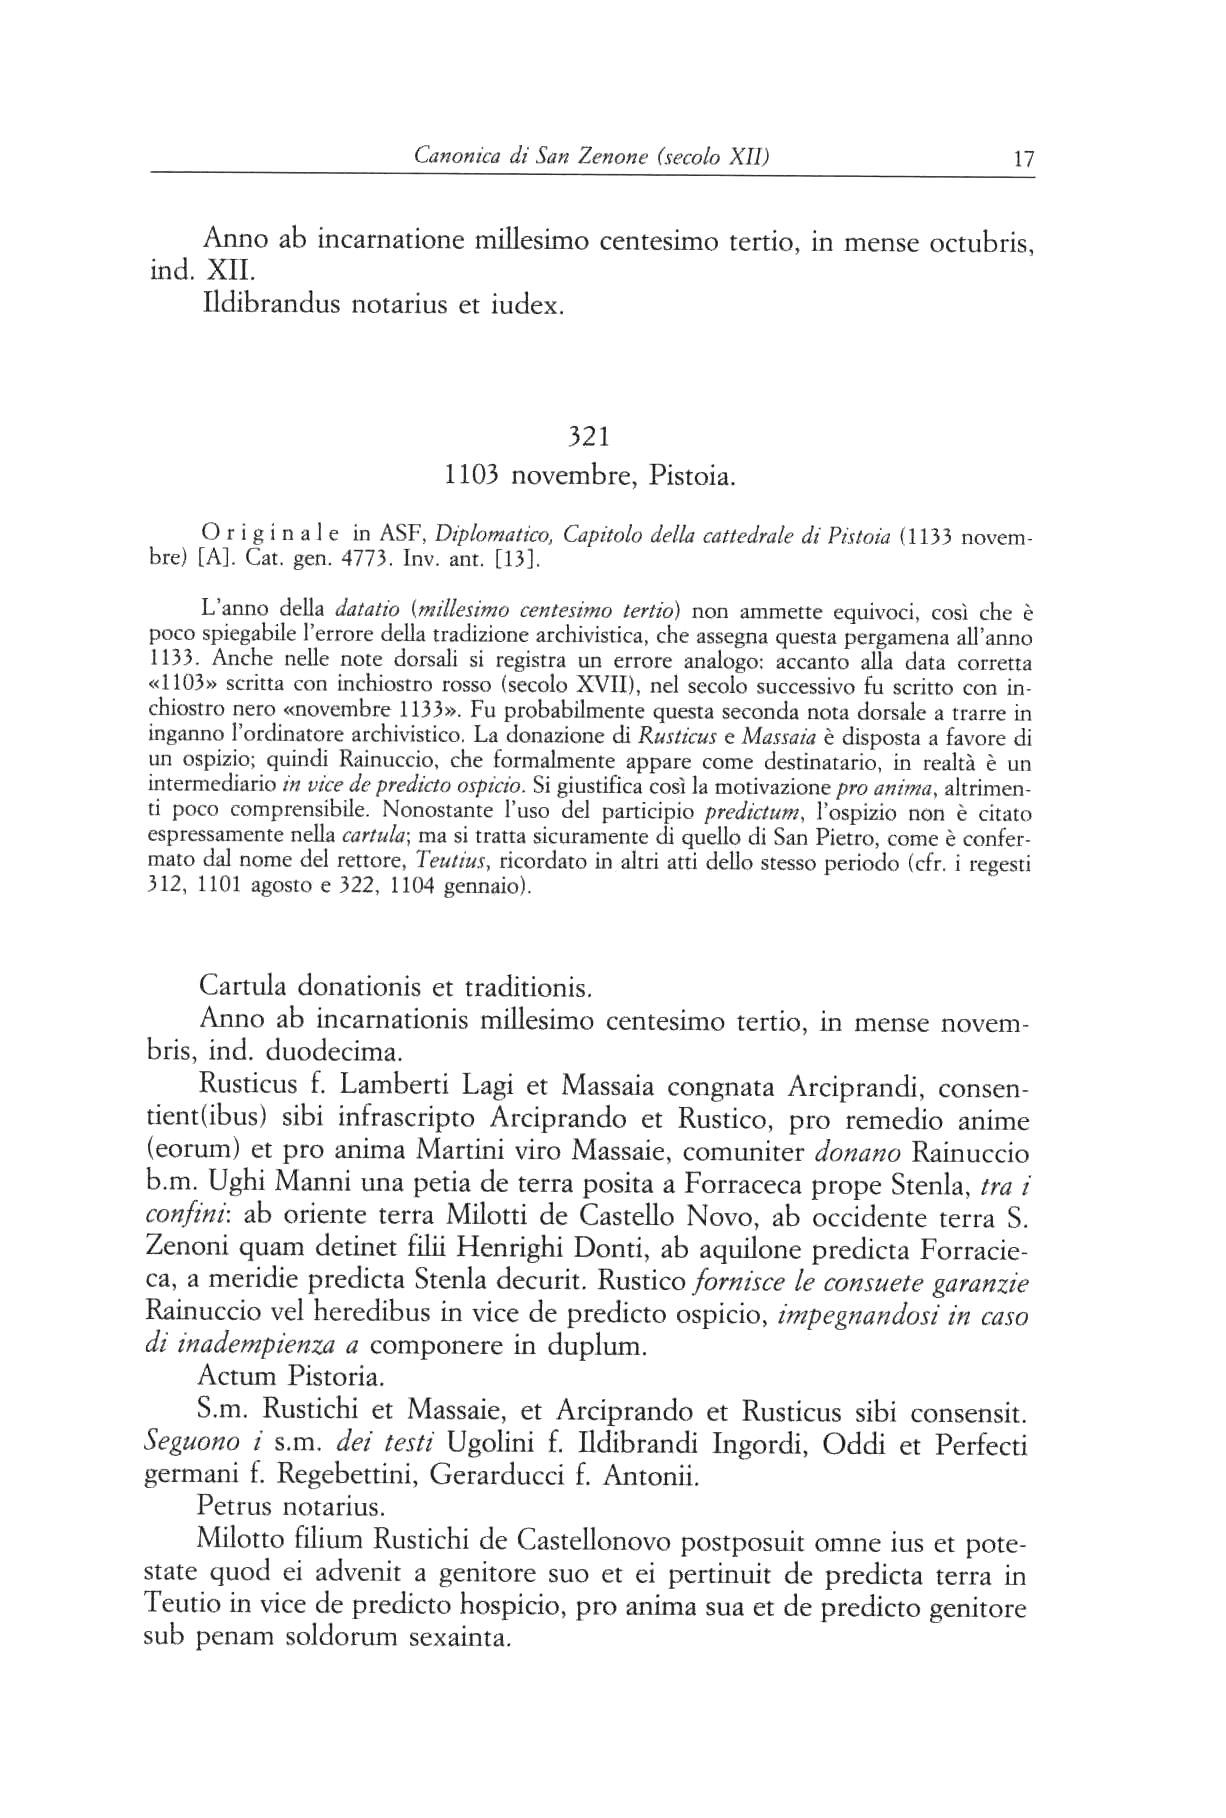 Canonica S. Zenone XII 0017.jpg